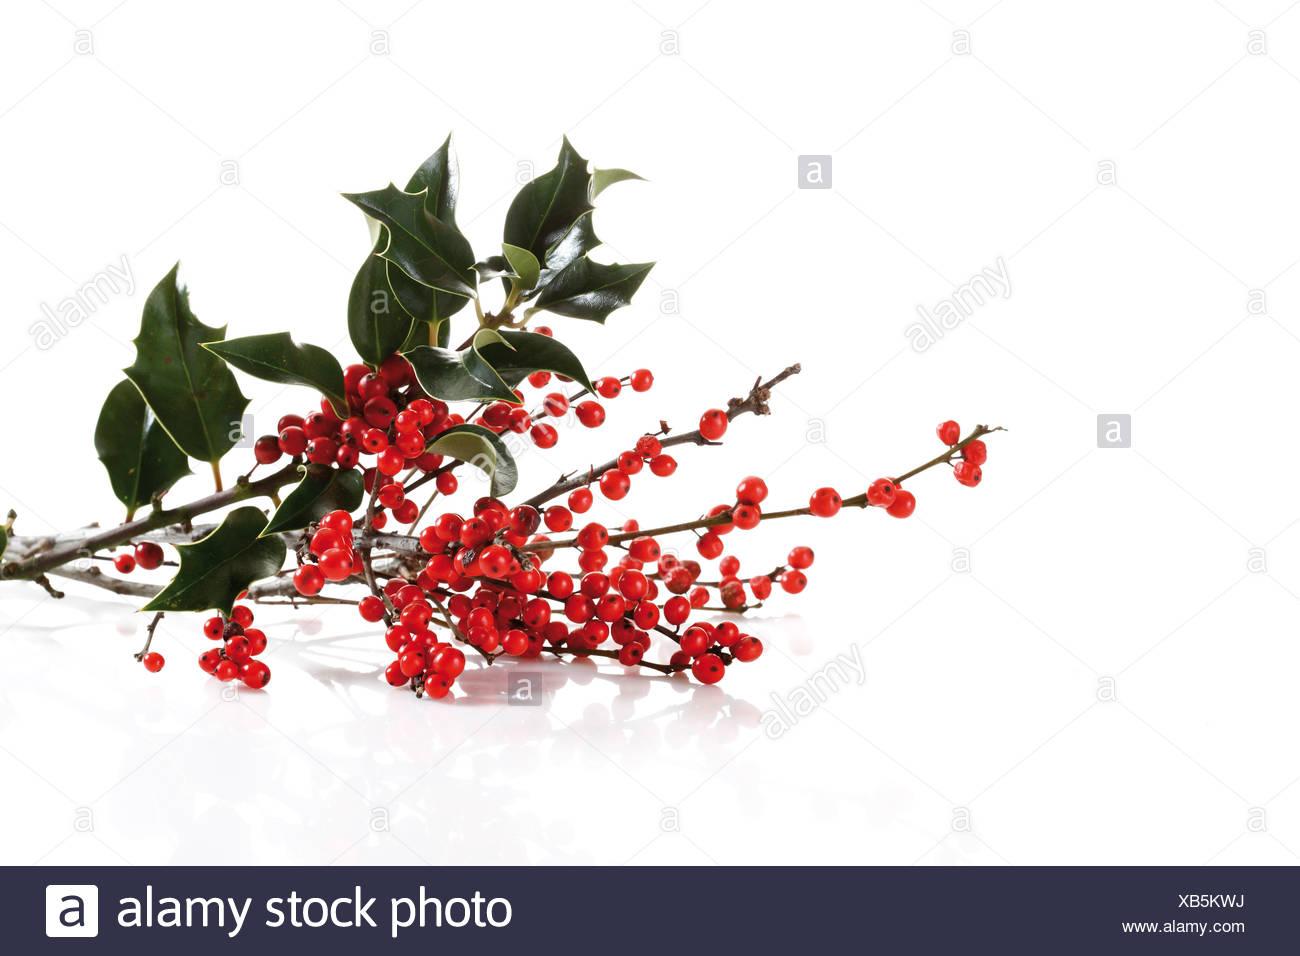 Holly (Ilex) with fruit - Stock Image